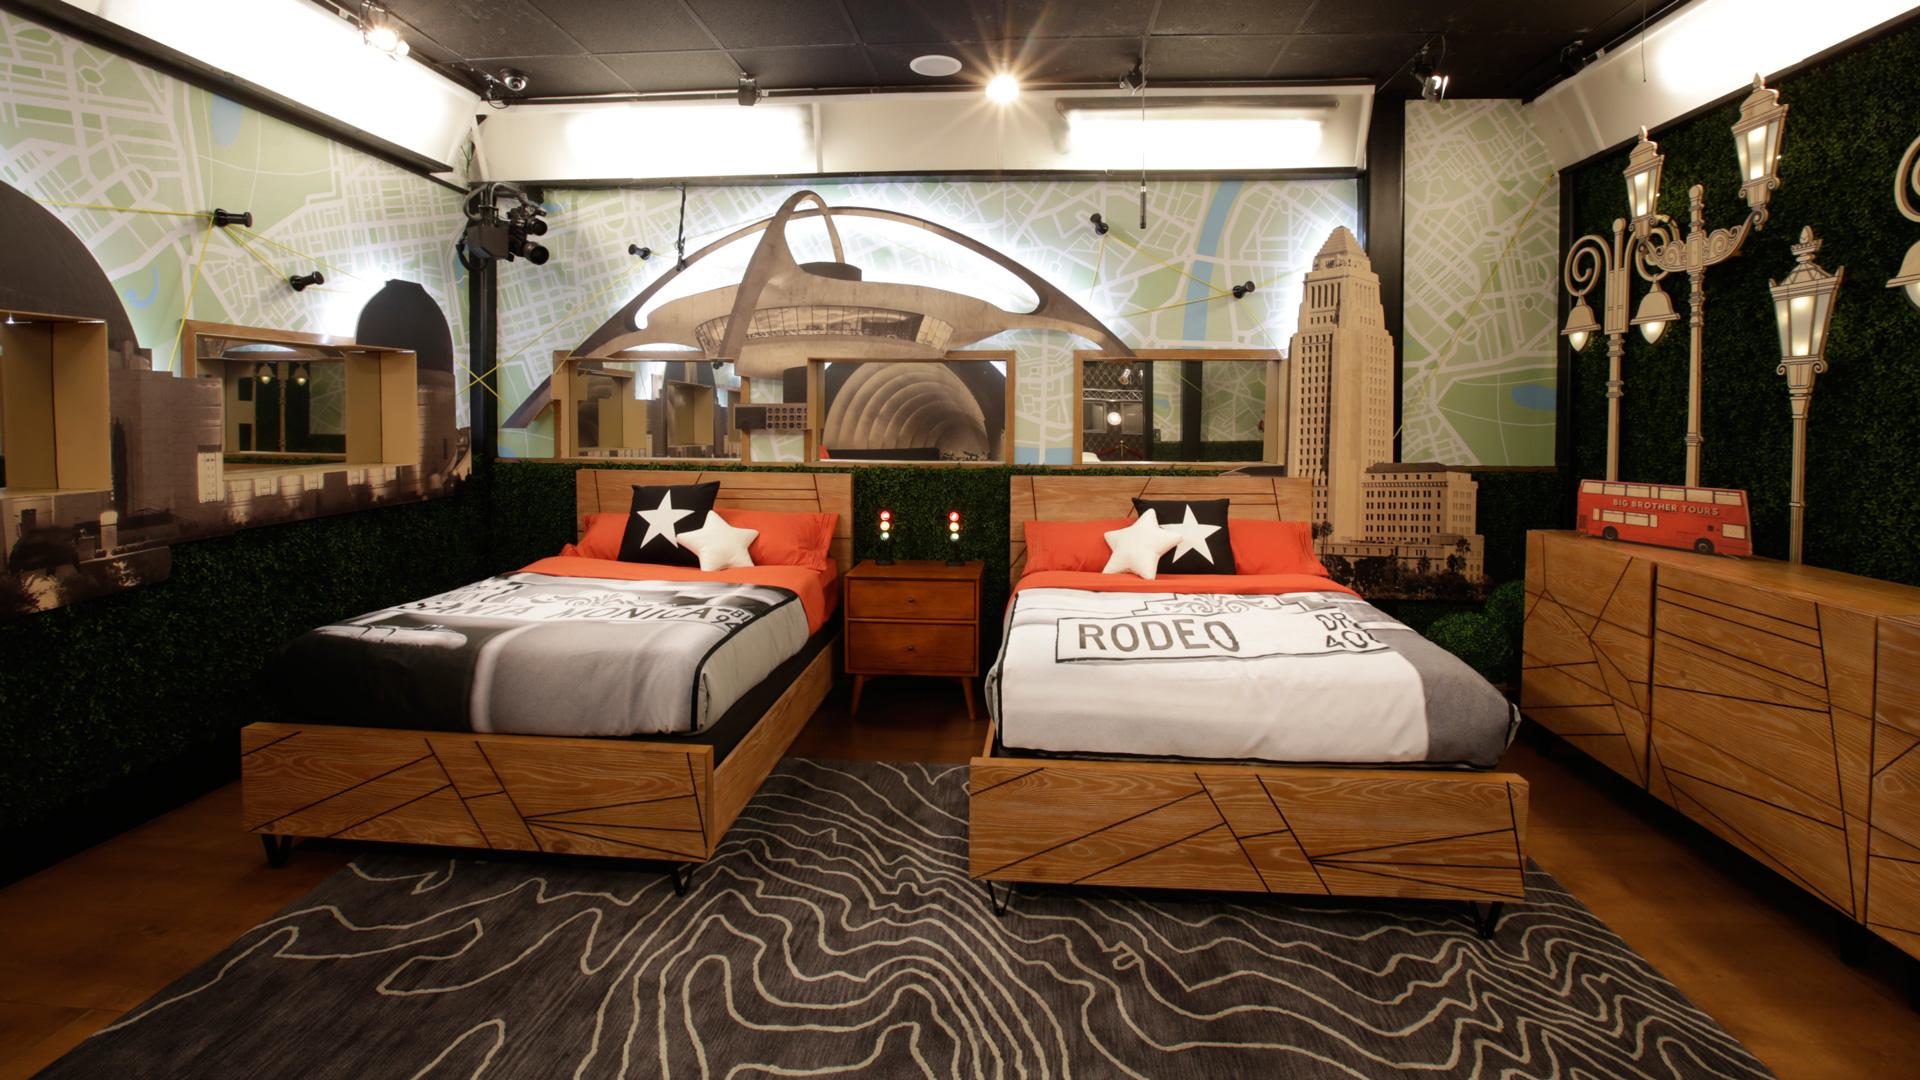 The third bedroom is focused on all of LA's famous landmarks.